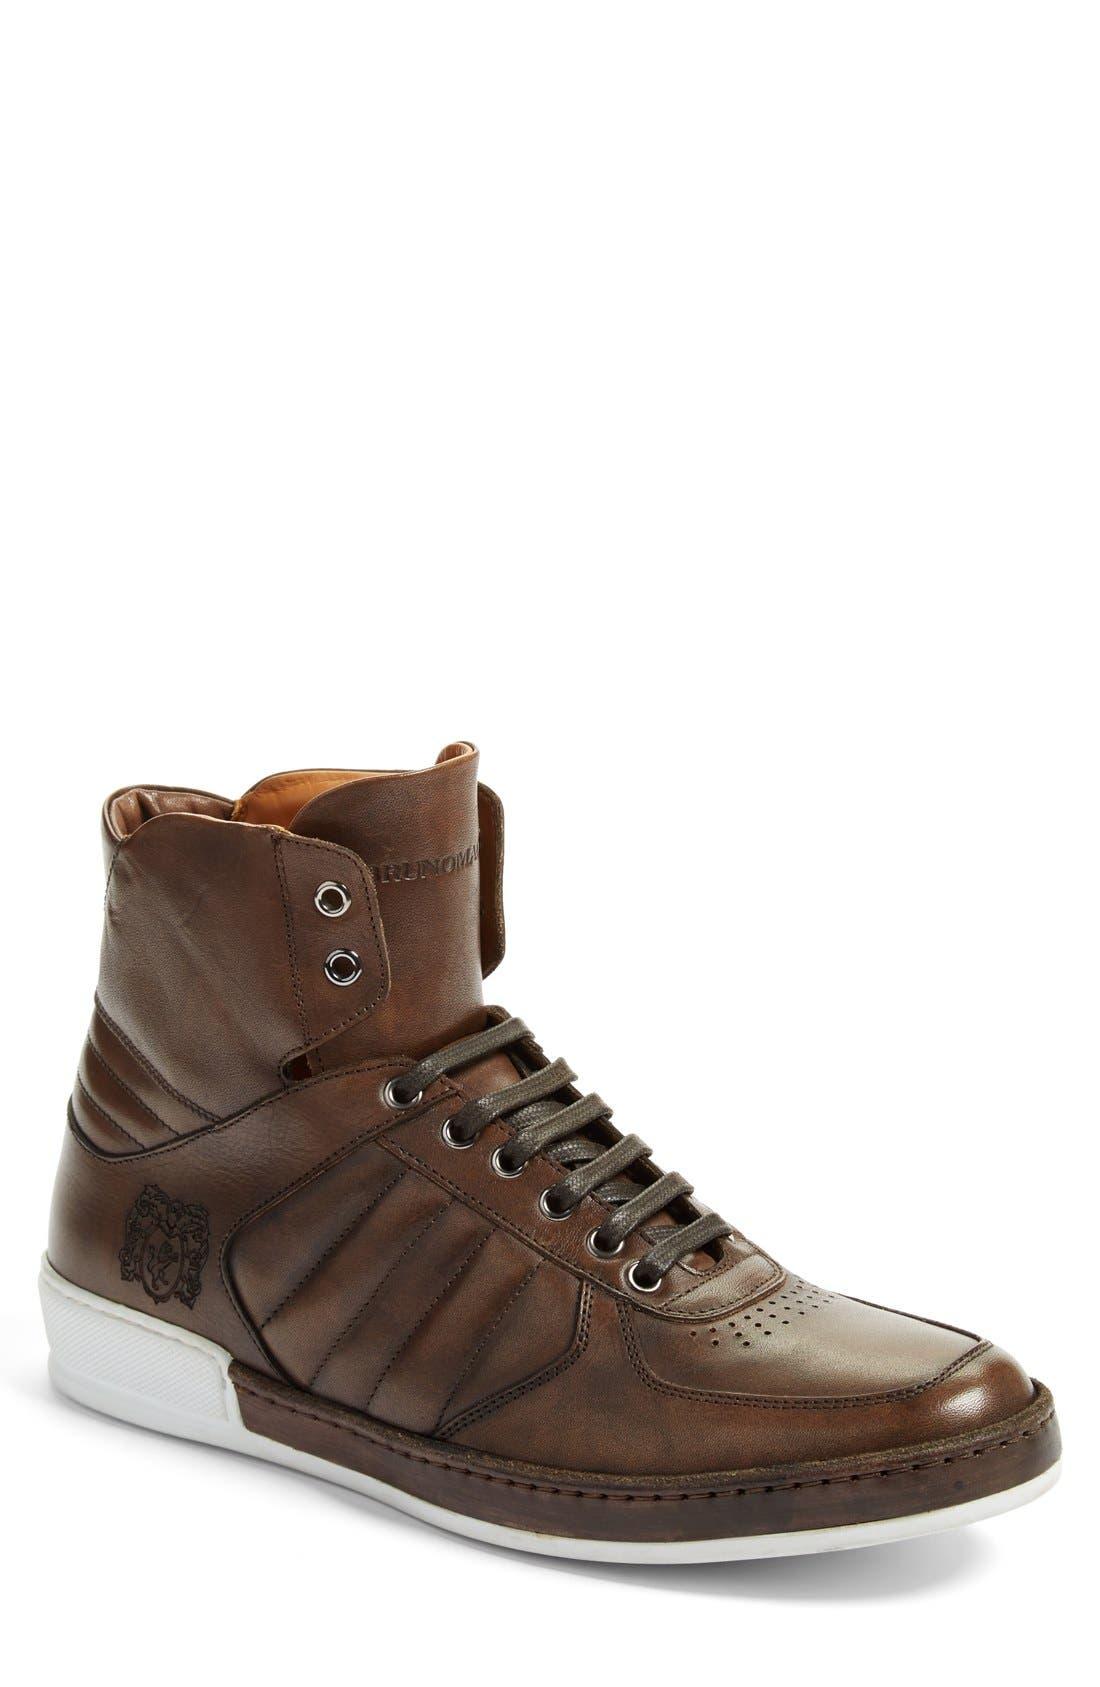 BRUNO MAGLI 'Siro' High Top Sneaker